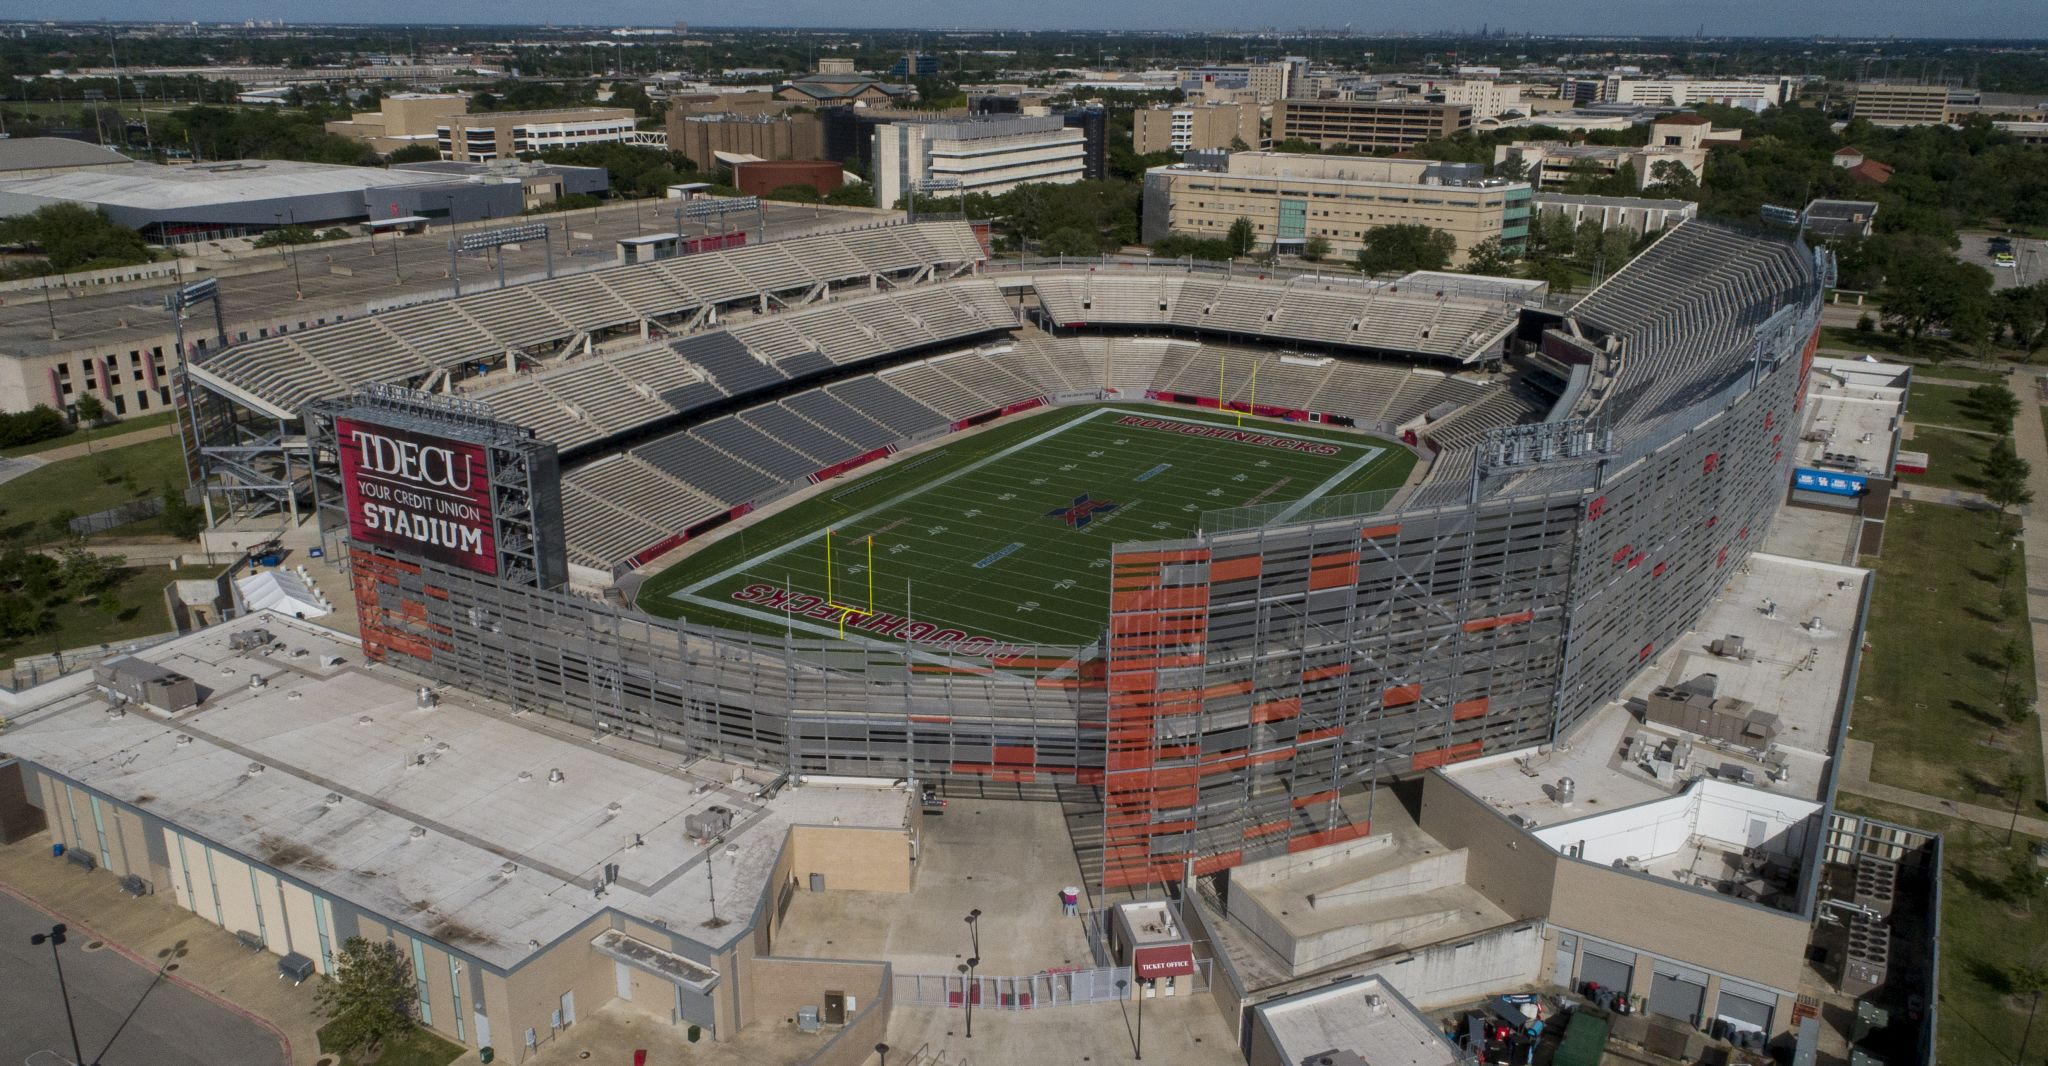 TDECU Stadium to host 25 percent capacity at UH football games